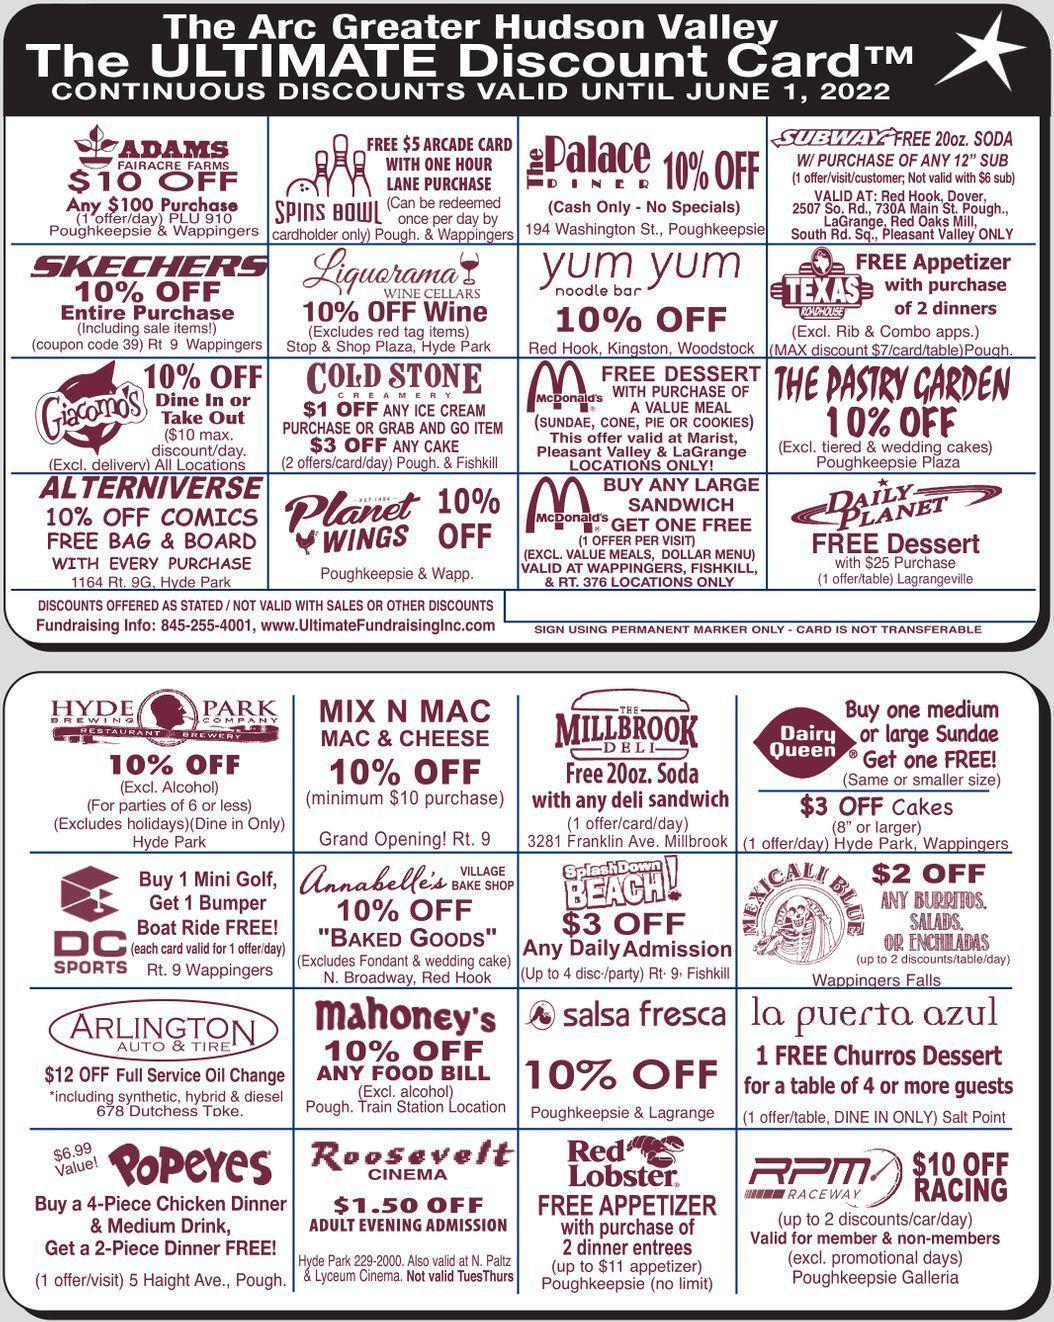 Dutchess County Discount Card